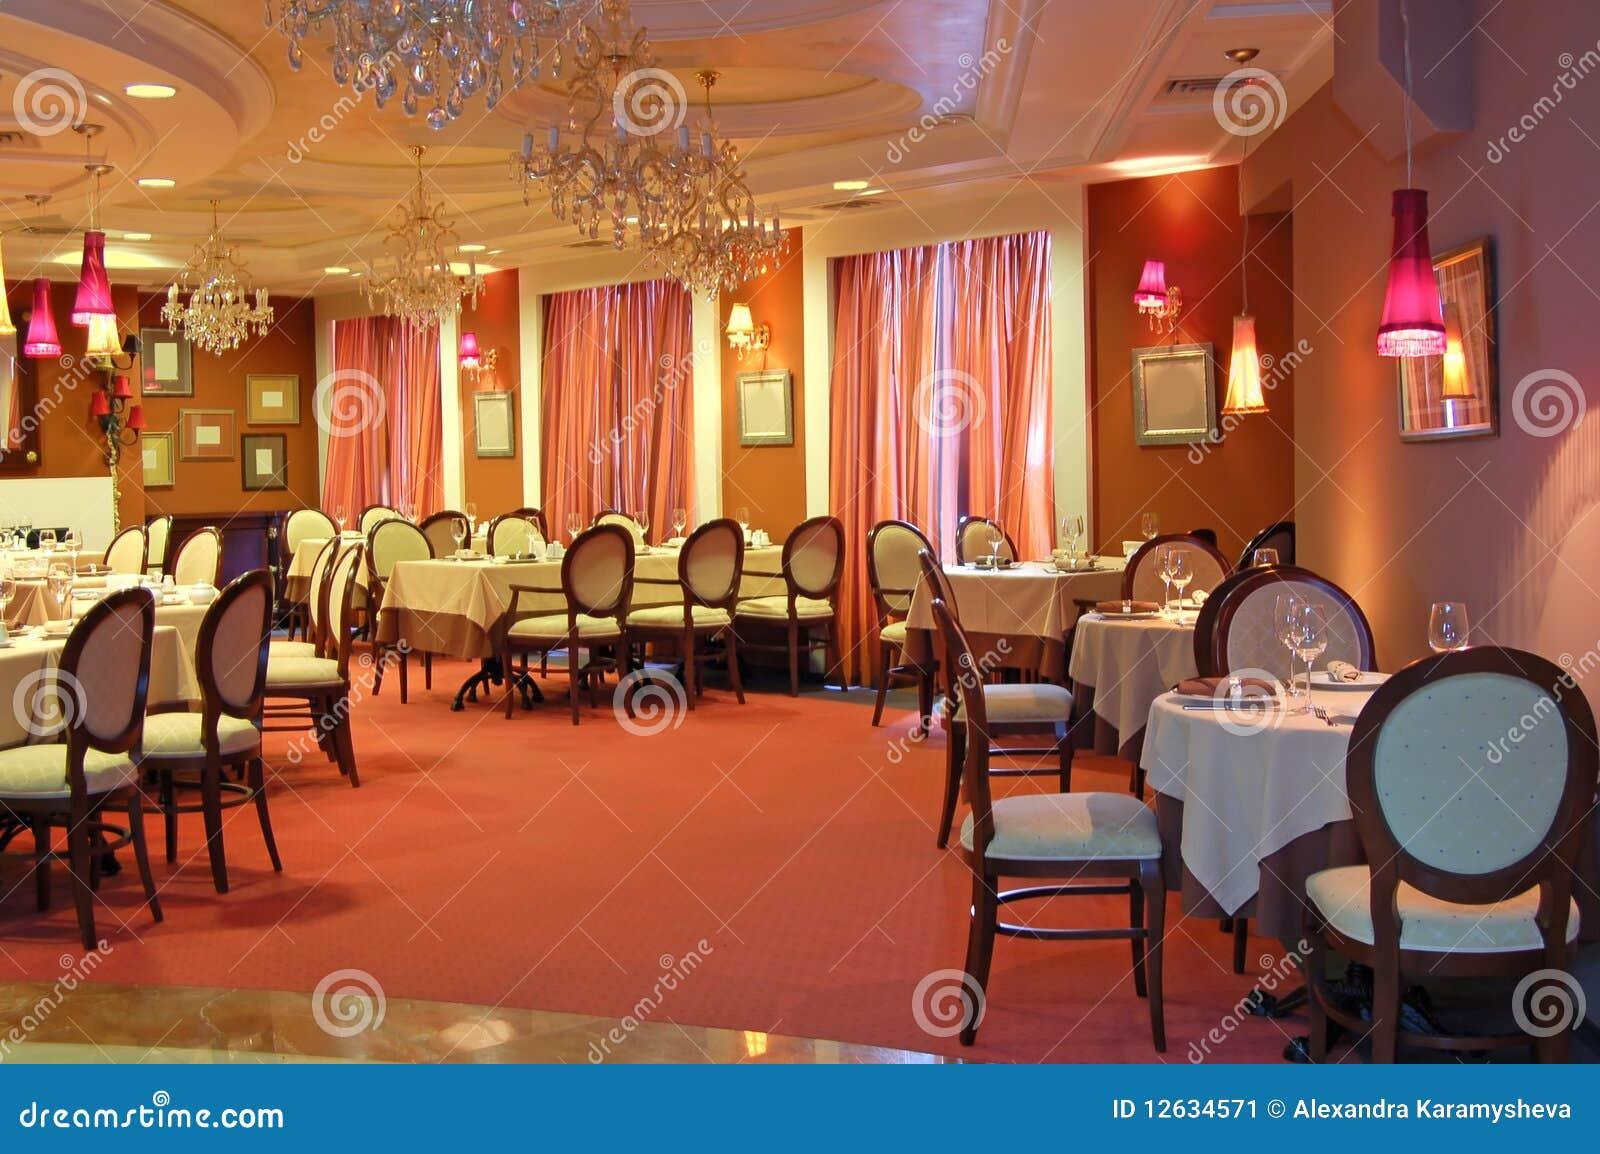 Red Restaurant Interior : Red restaurant interior stock image